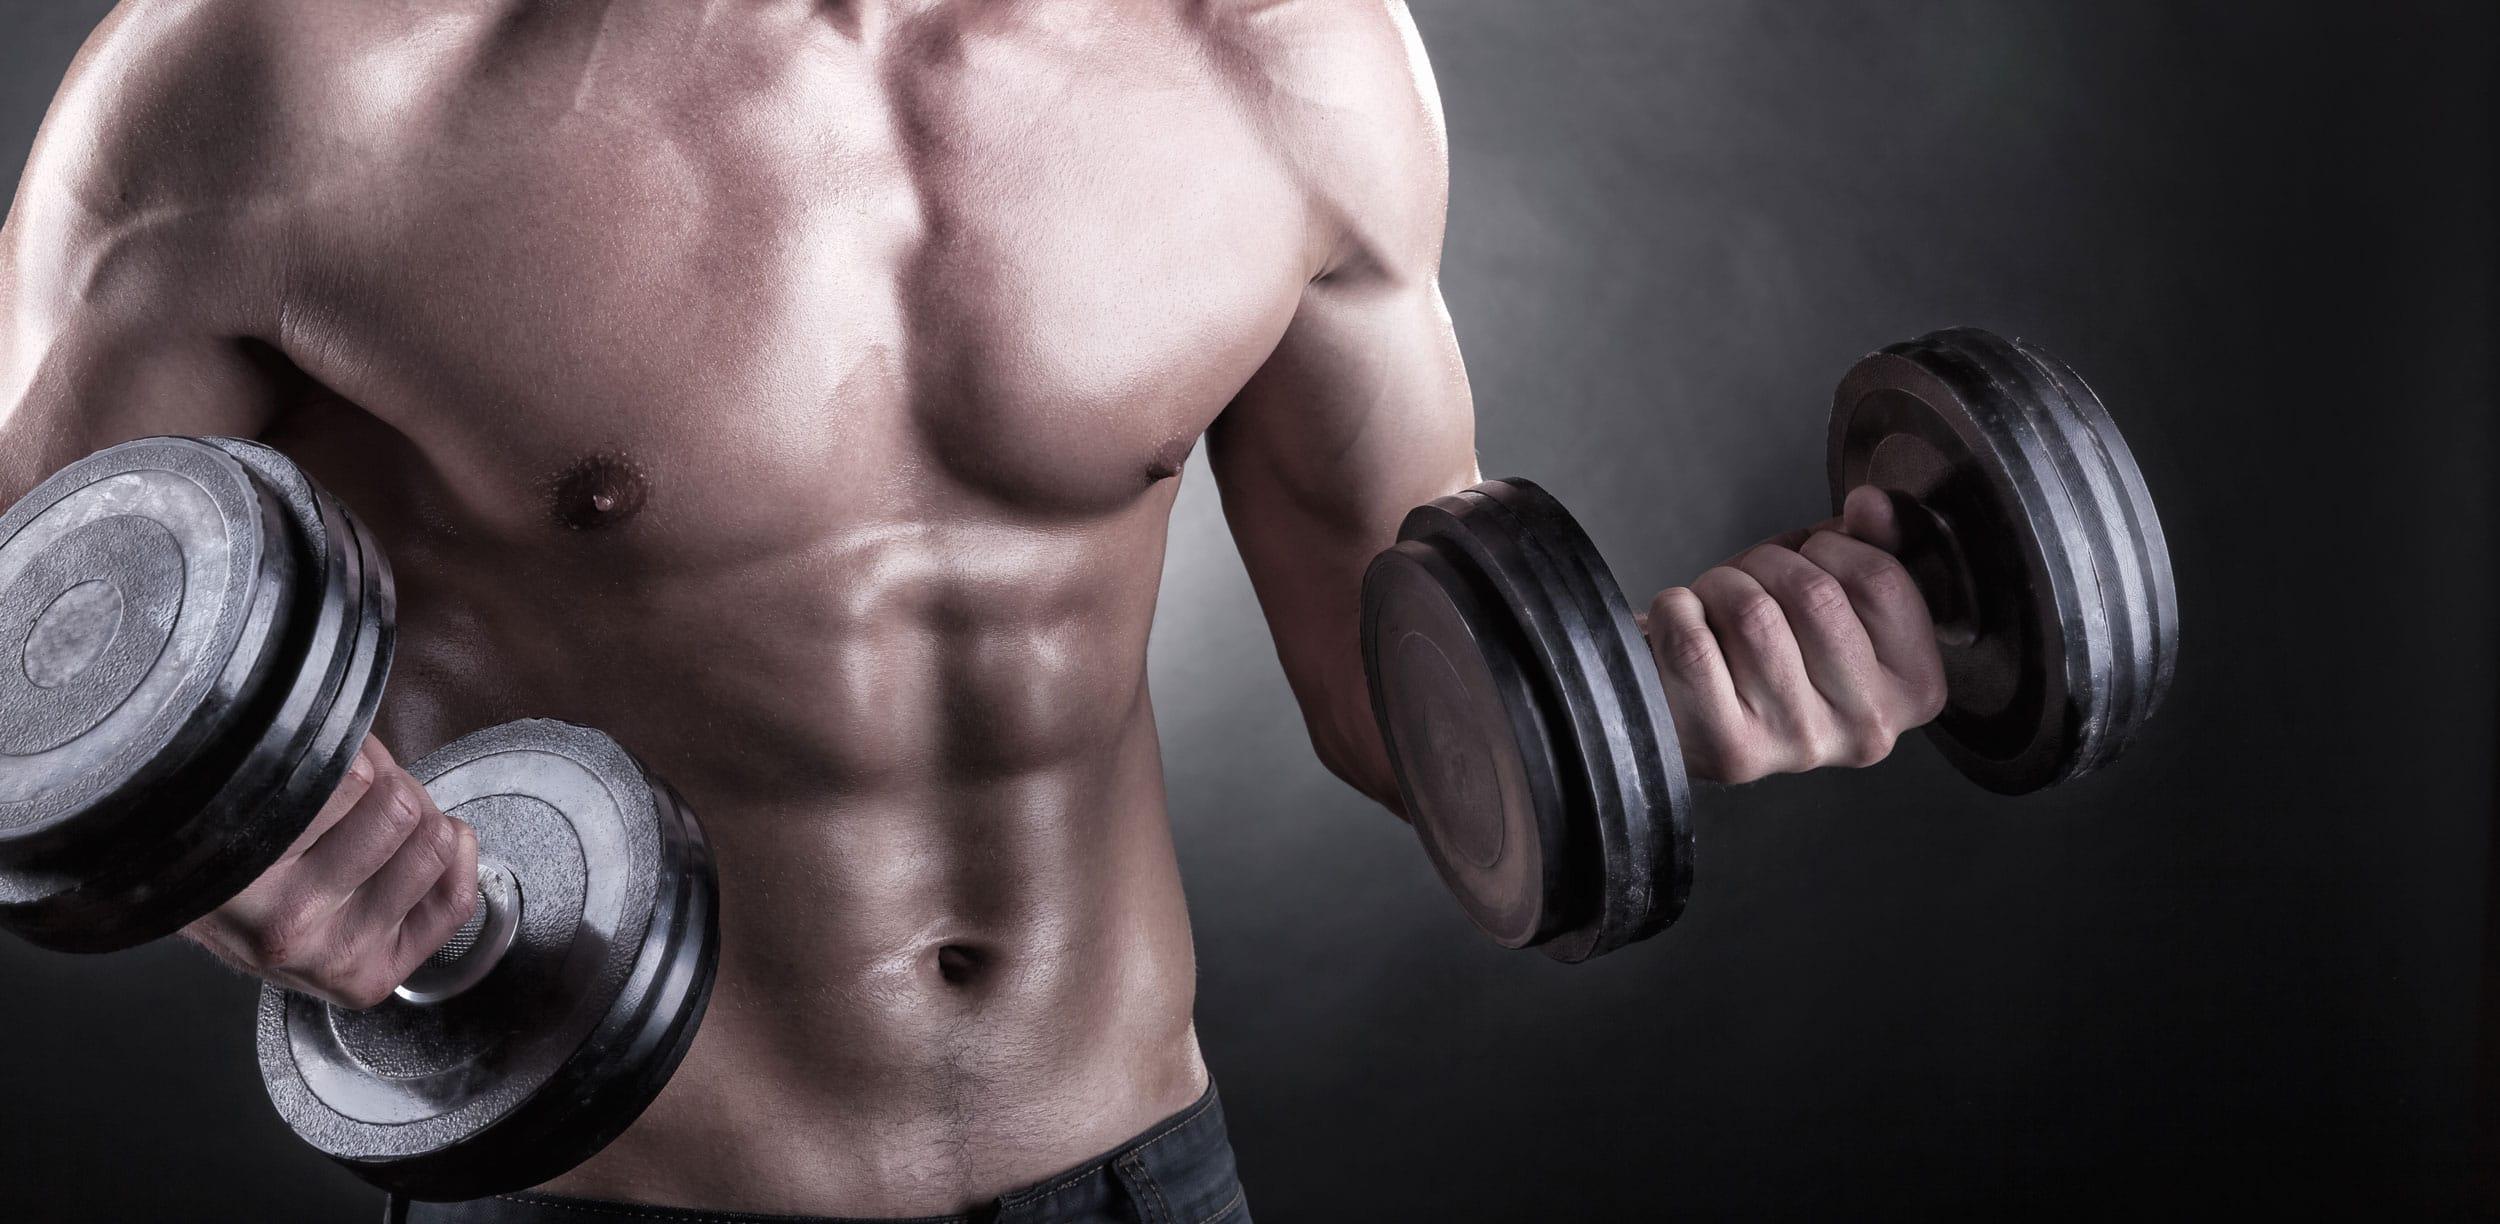 Хорошая физподготовка защищает мужчин от рака